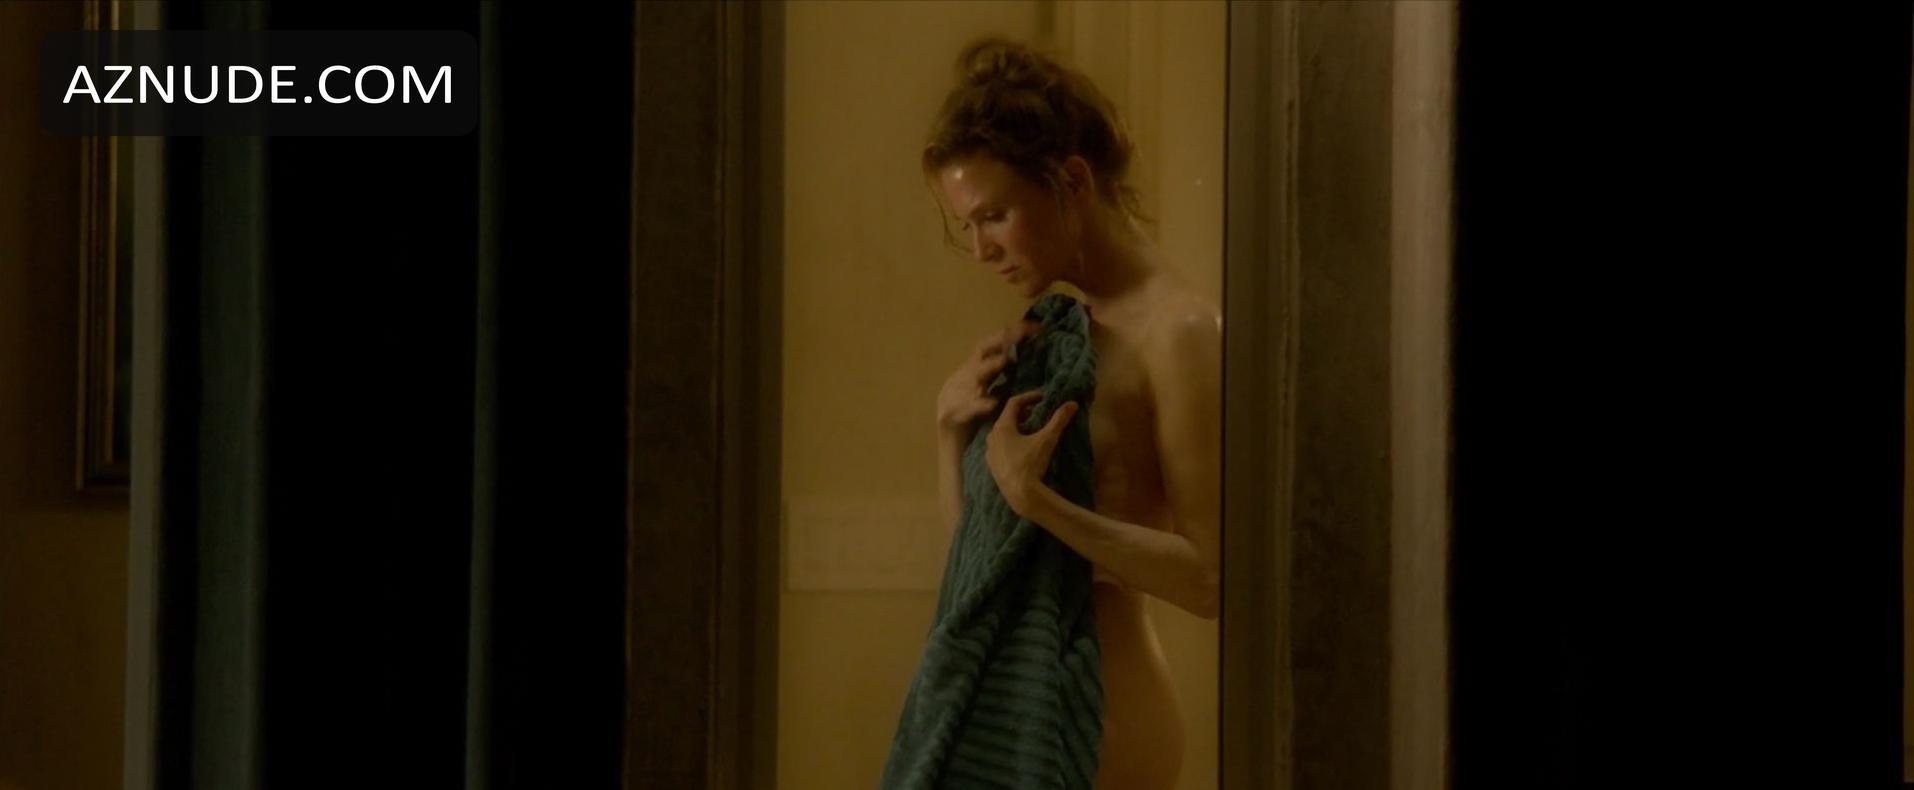 Renee Zellweger Nude - Aznude-3192